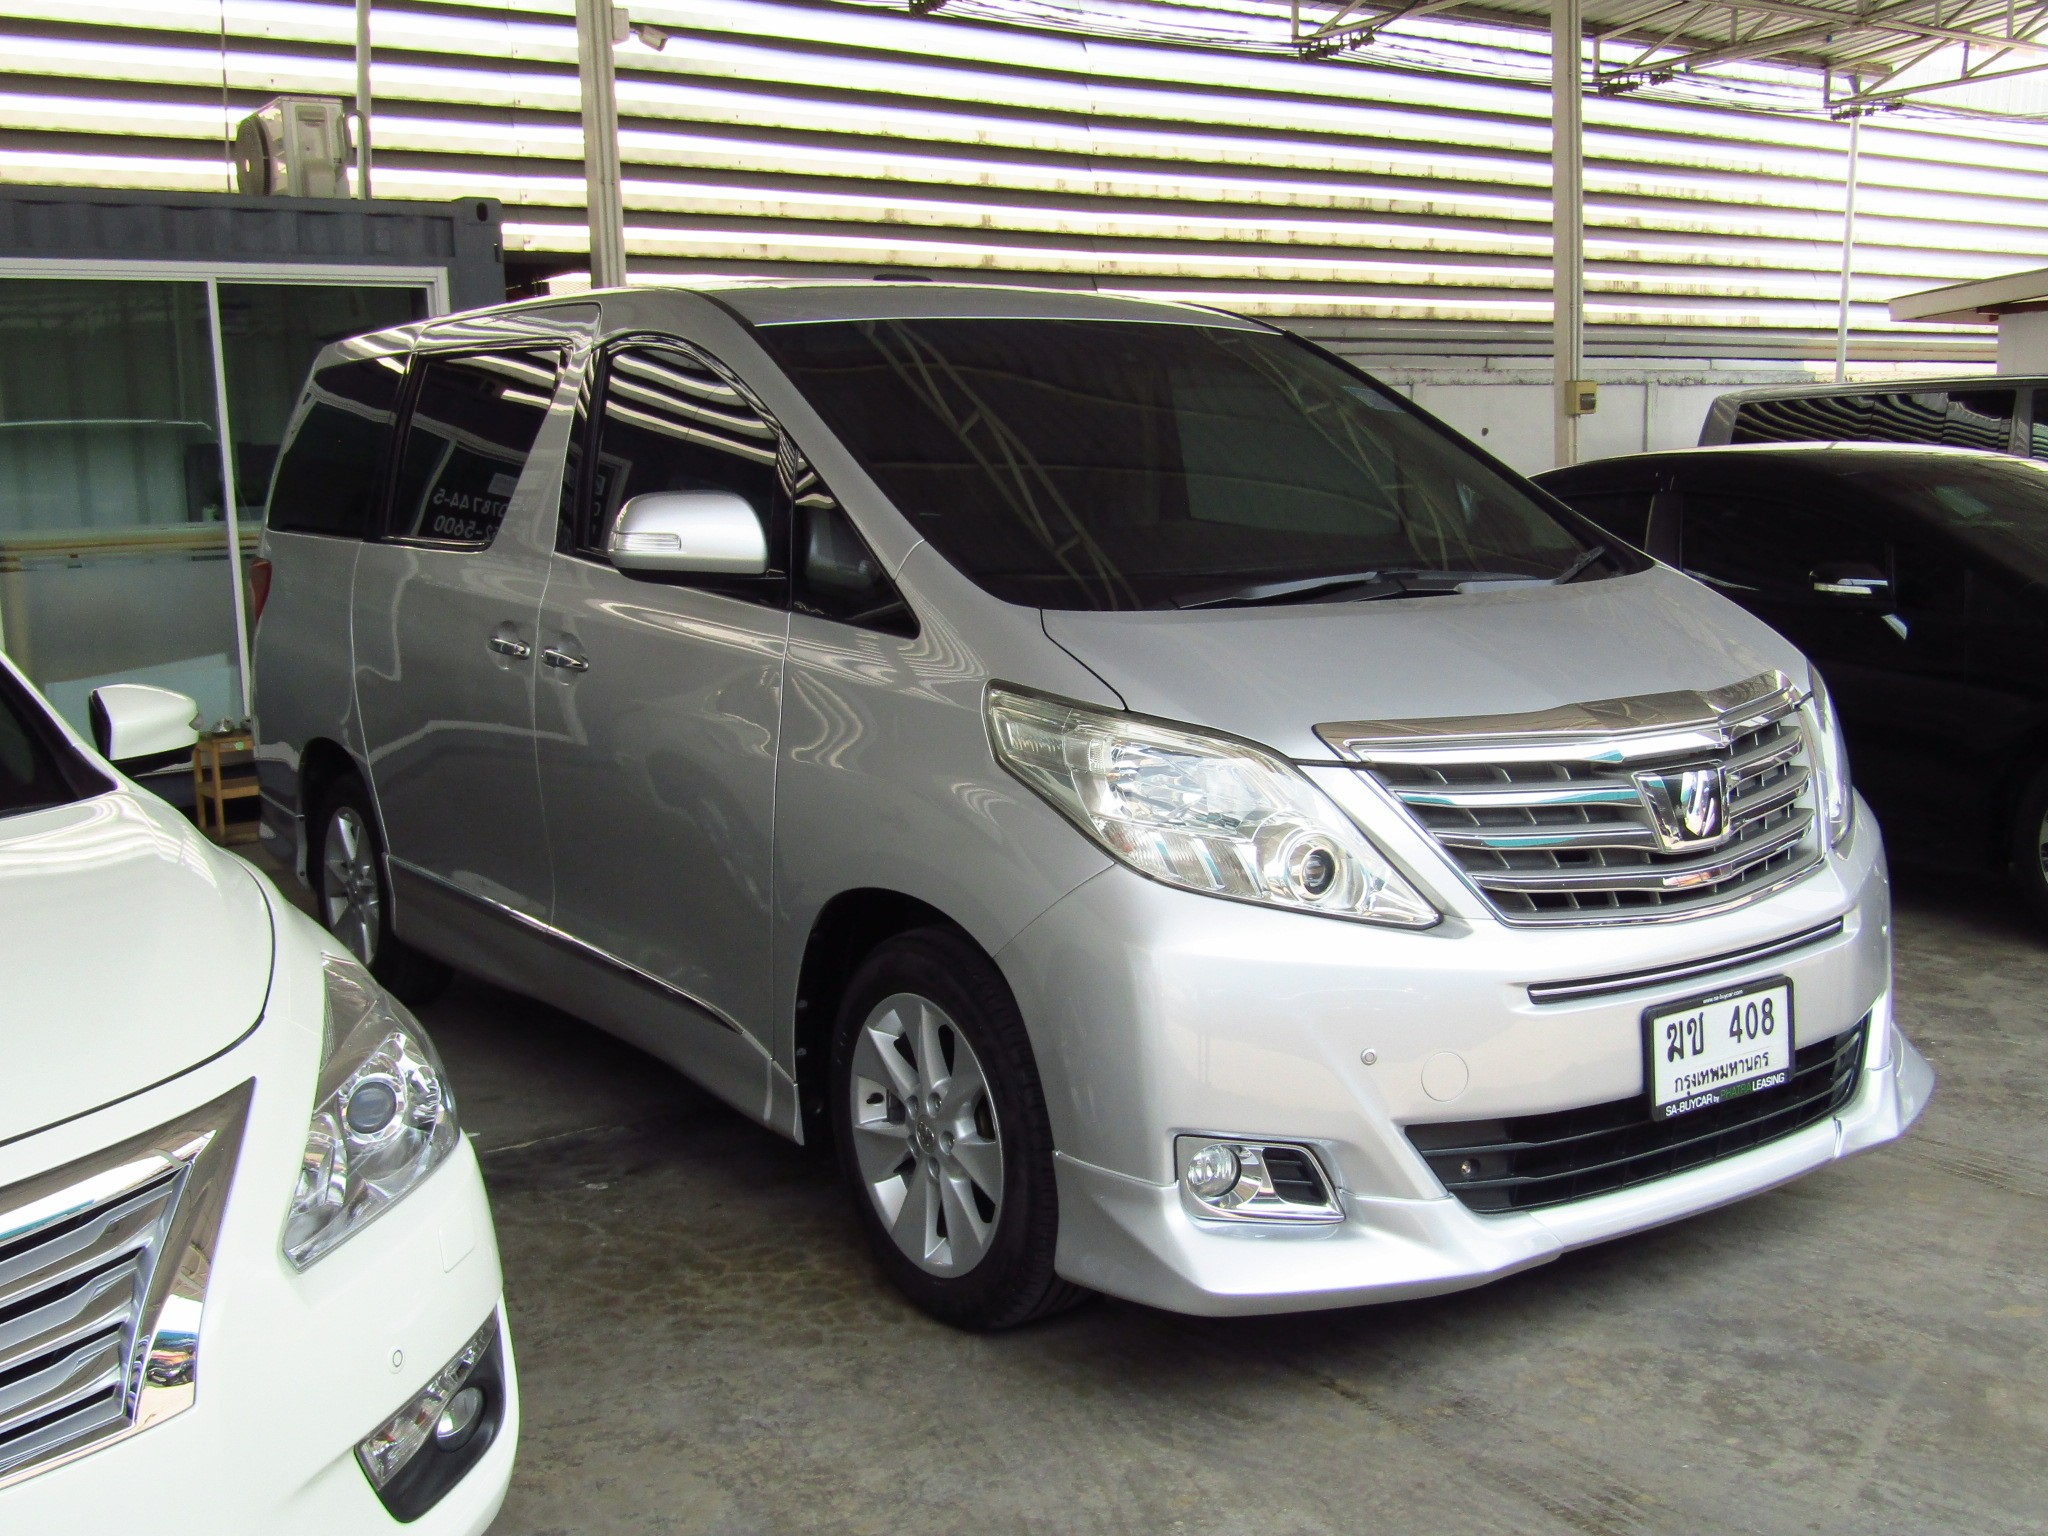 Toyota Alphard (117,xxx)  2.4 V AT Van  (ผ่อน 33,580 บาท*48เดือน )